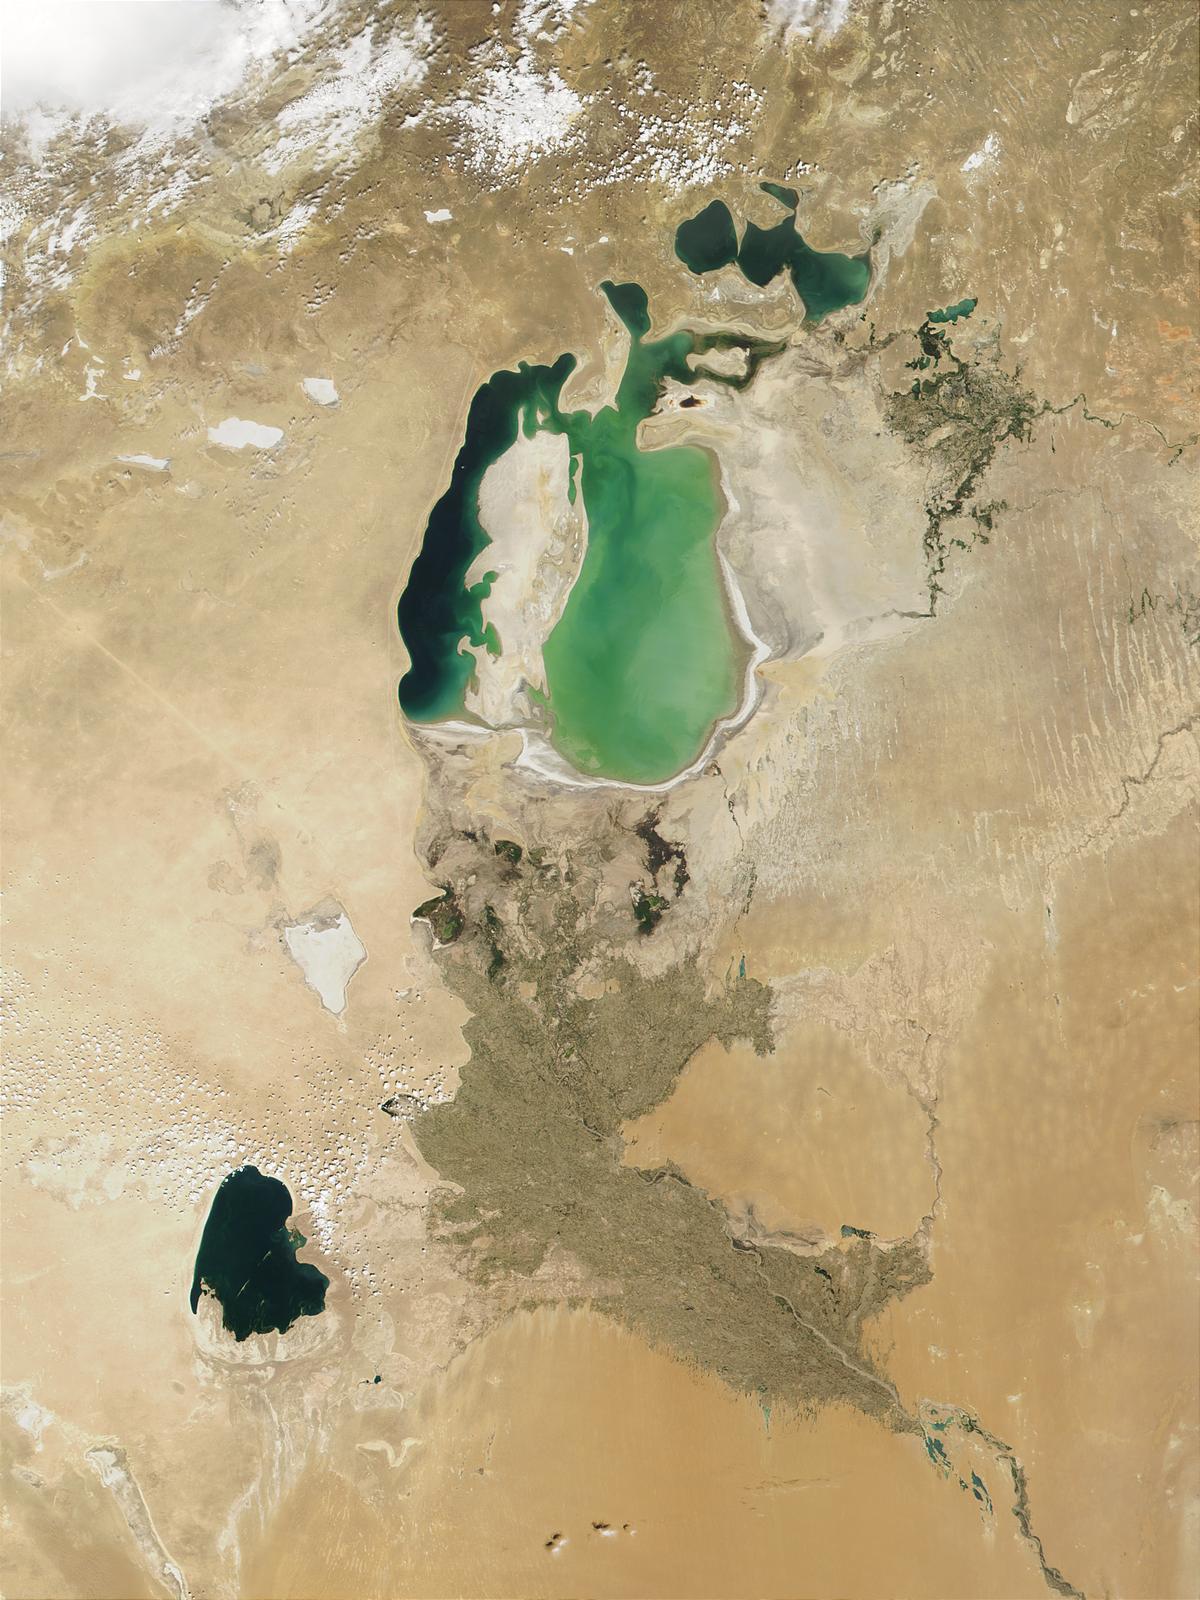 File:AralSea.A2001165.0710.500m.jpg - Wikimedia Commons